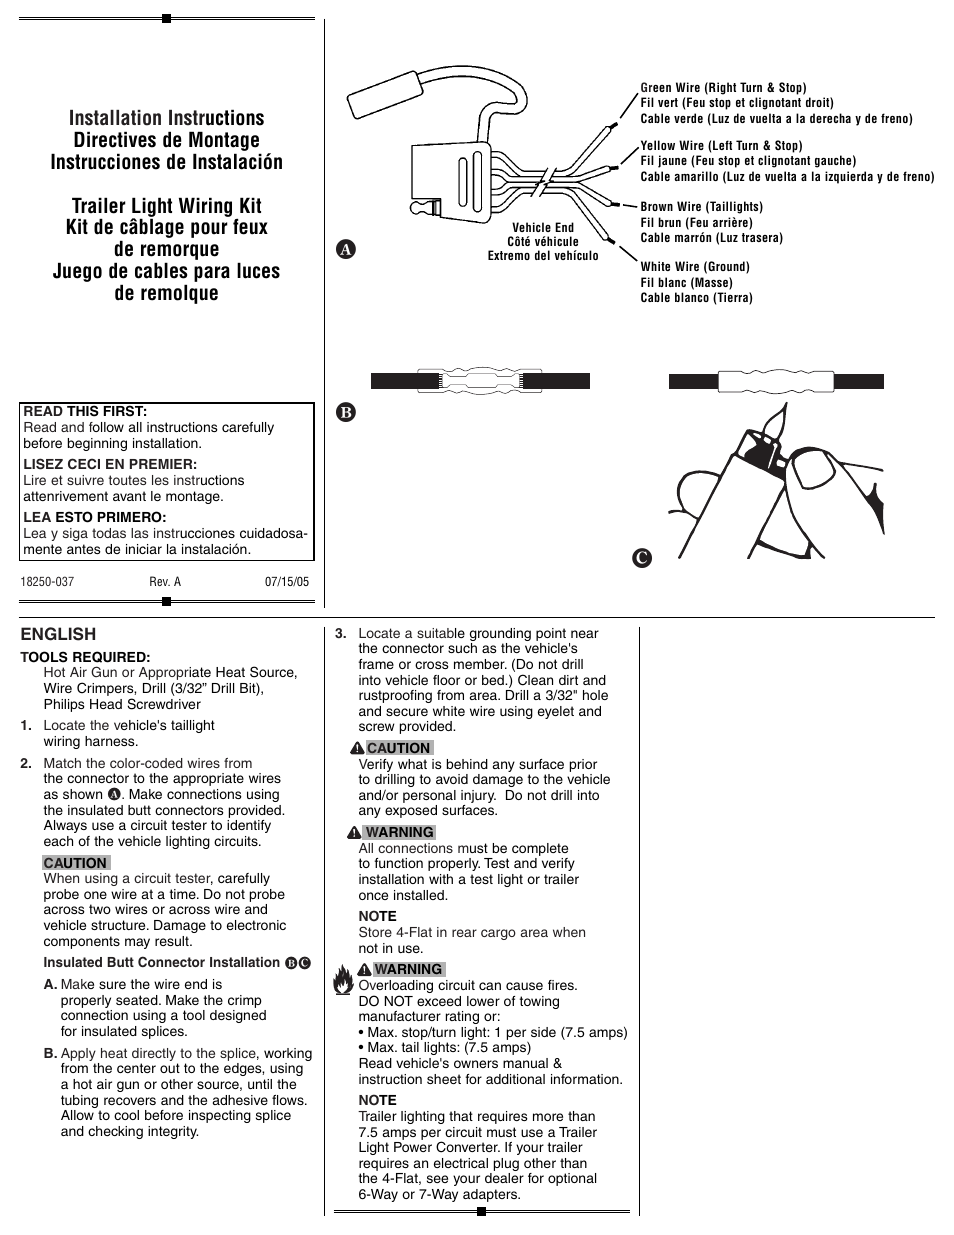 Draw-Tite 20252 4-FLAT WIRING KIT User Manual | 2 pages